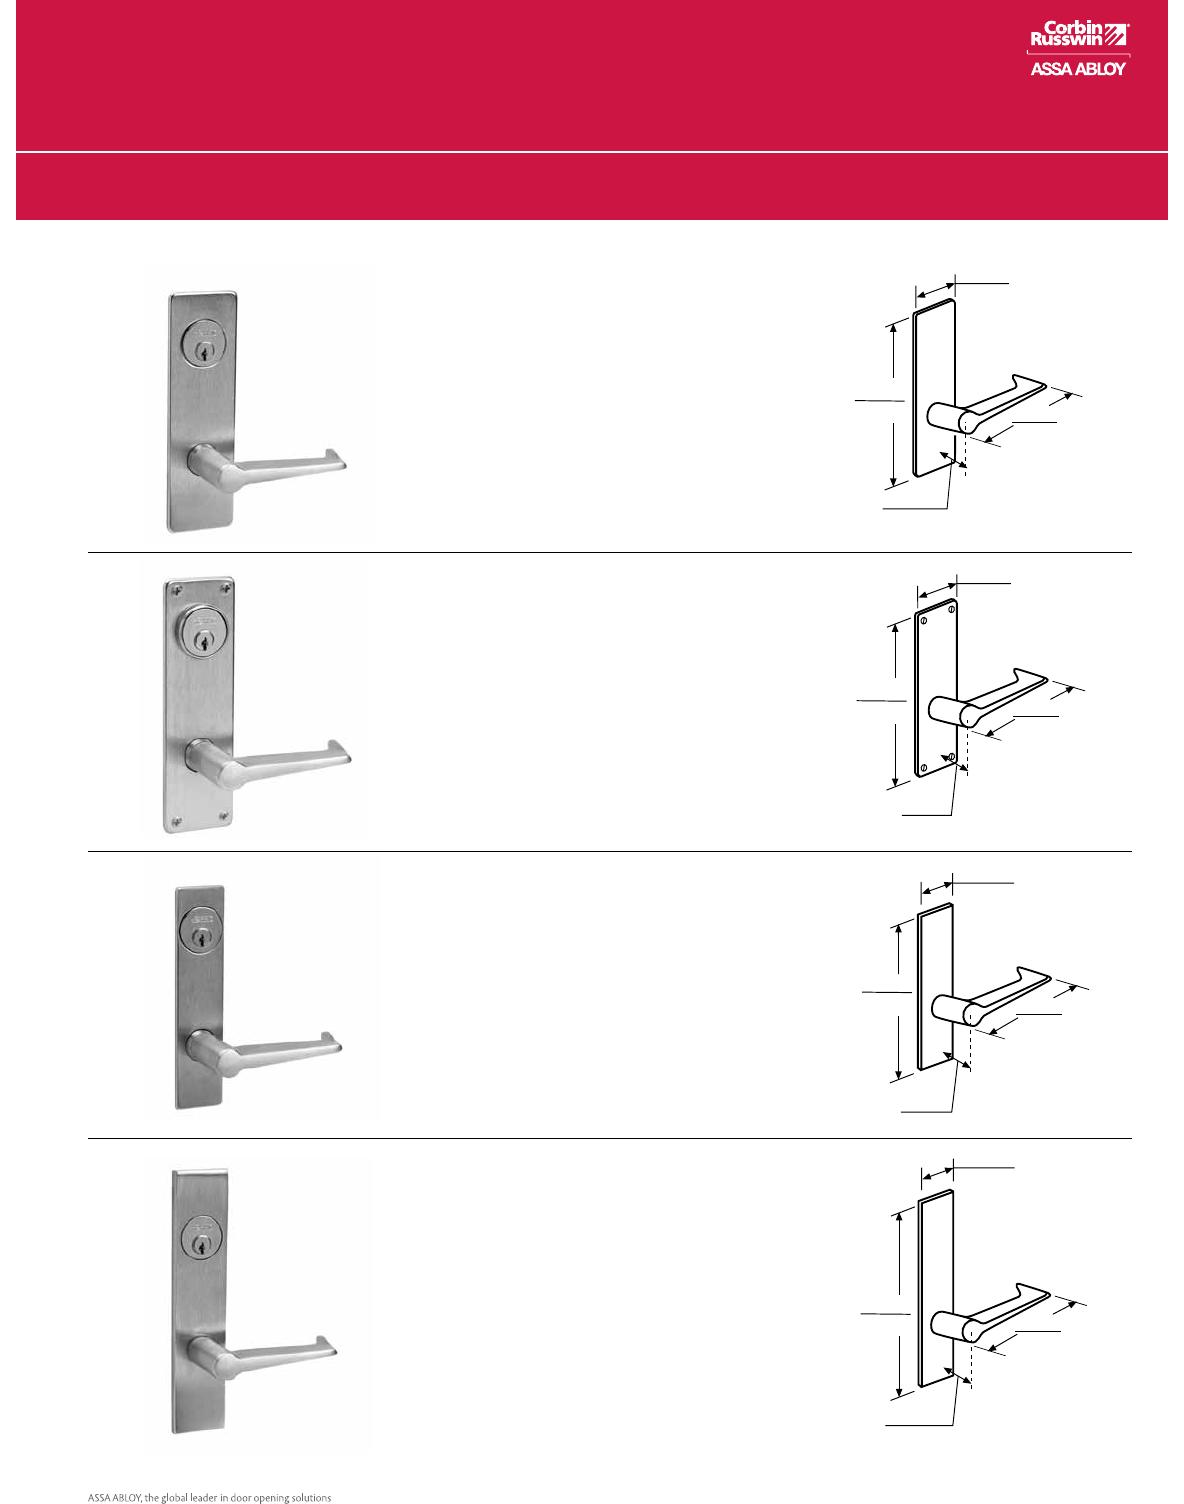 Entrance//Entry//Office Steel; Stainless Steel; Brass Corbin Russwin Architectural Hardware CORBINRUSSWIN ML2048-LWM-626-LC 626 Satin Chrome Lever LWM Lustra